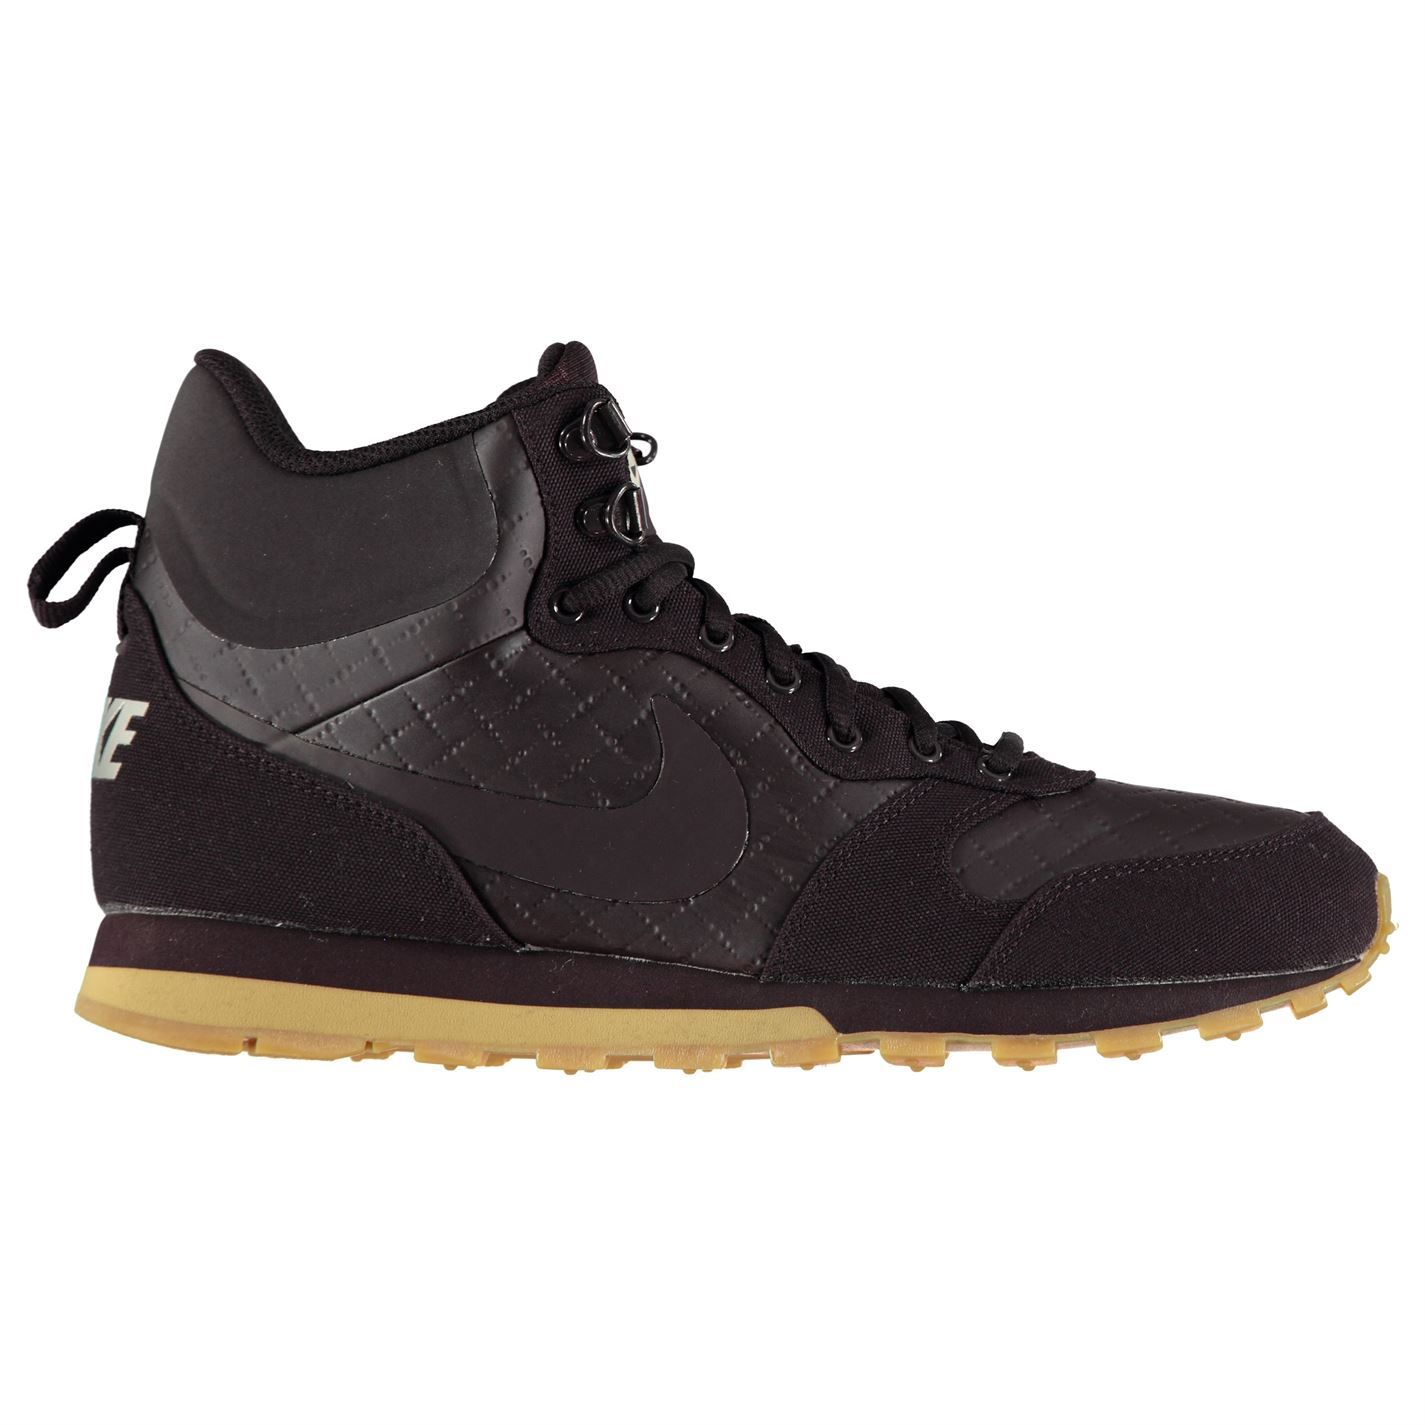 scarpe nike alte uomo